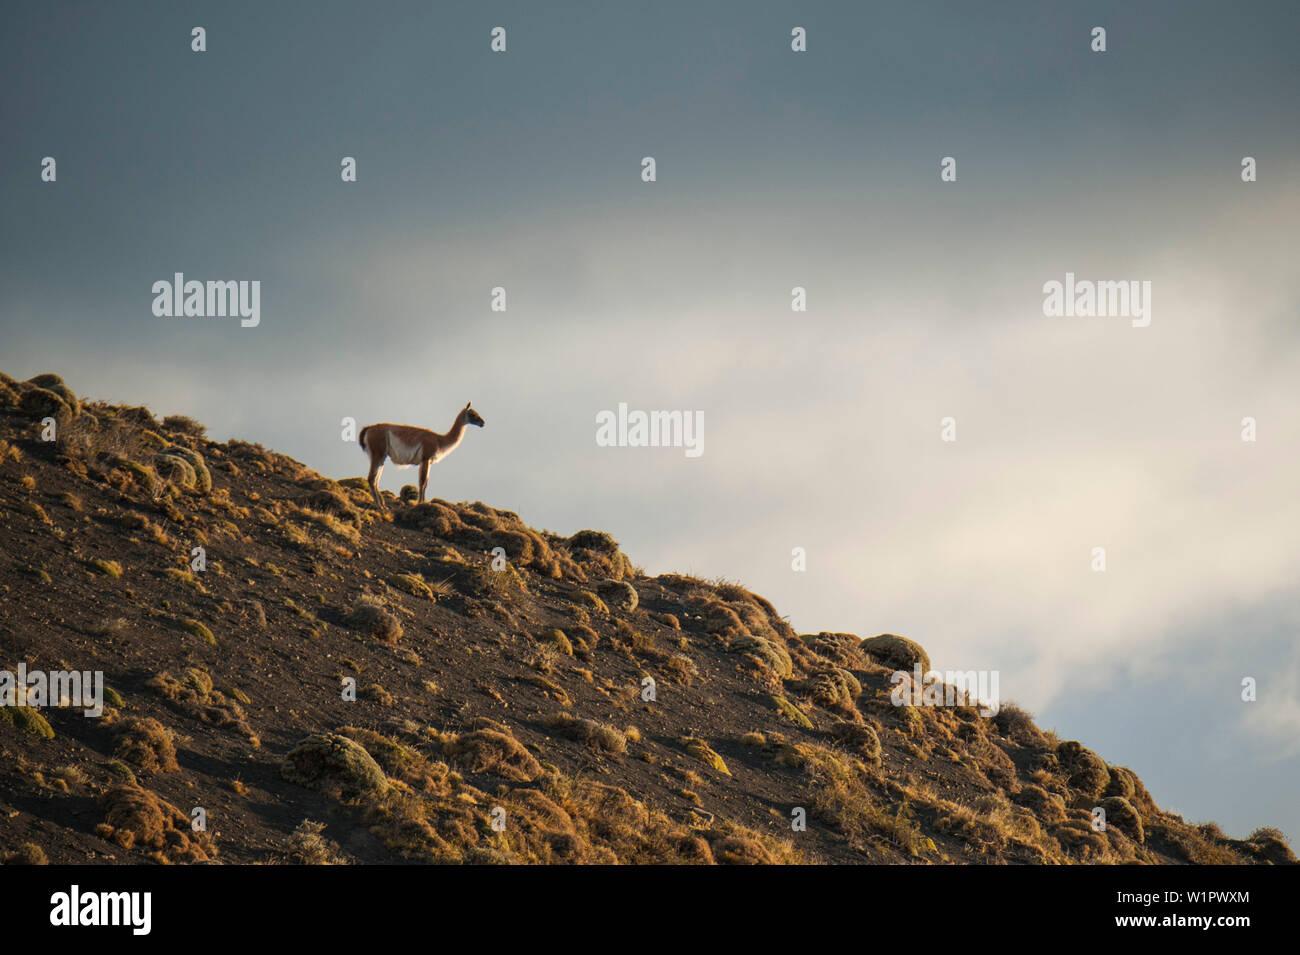 A guanaco (Lama guanicoe) stands alone on a hillside in the sun, Torres del Paine National Park, Magallanes y de la Antartica Chilena, Patagonia, Chil - Stock Image